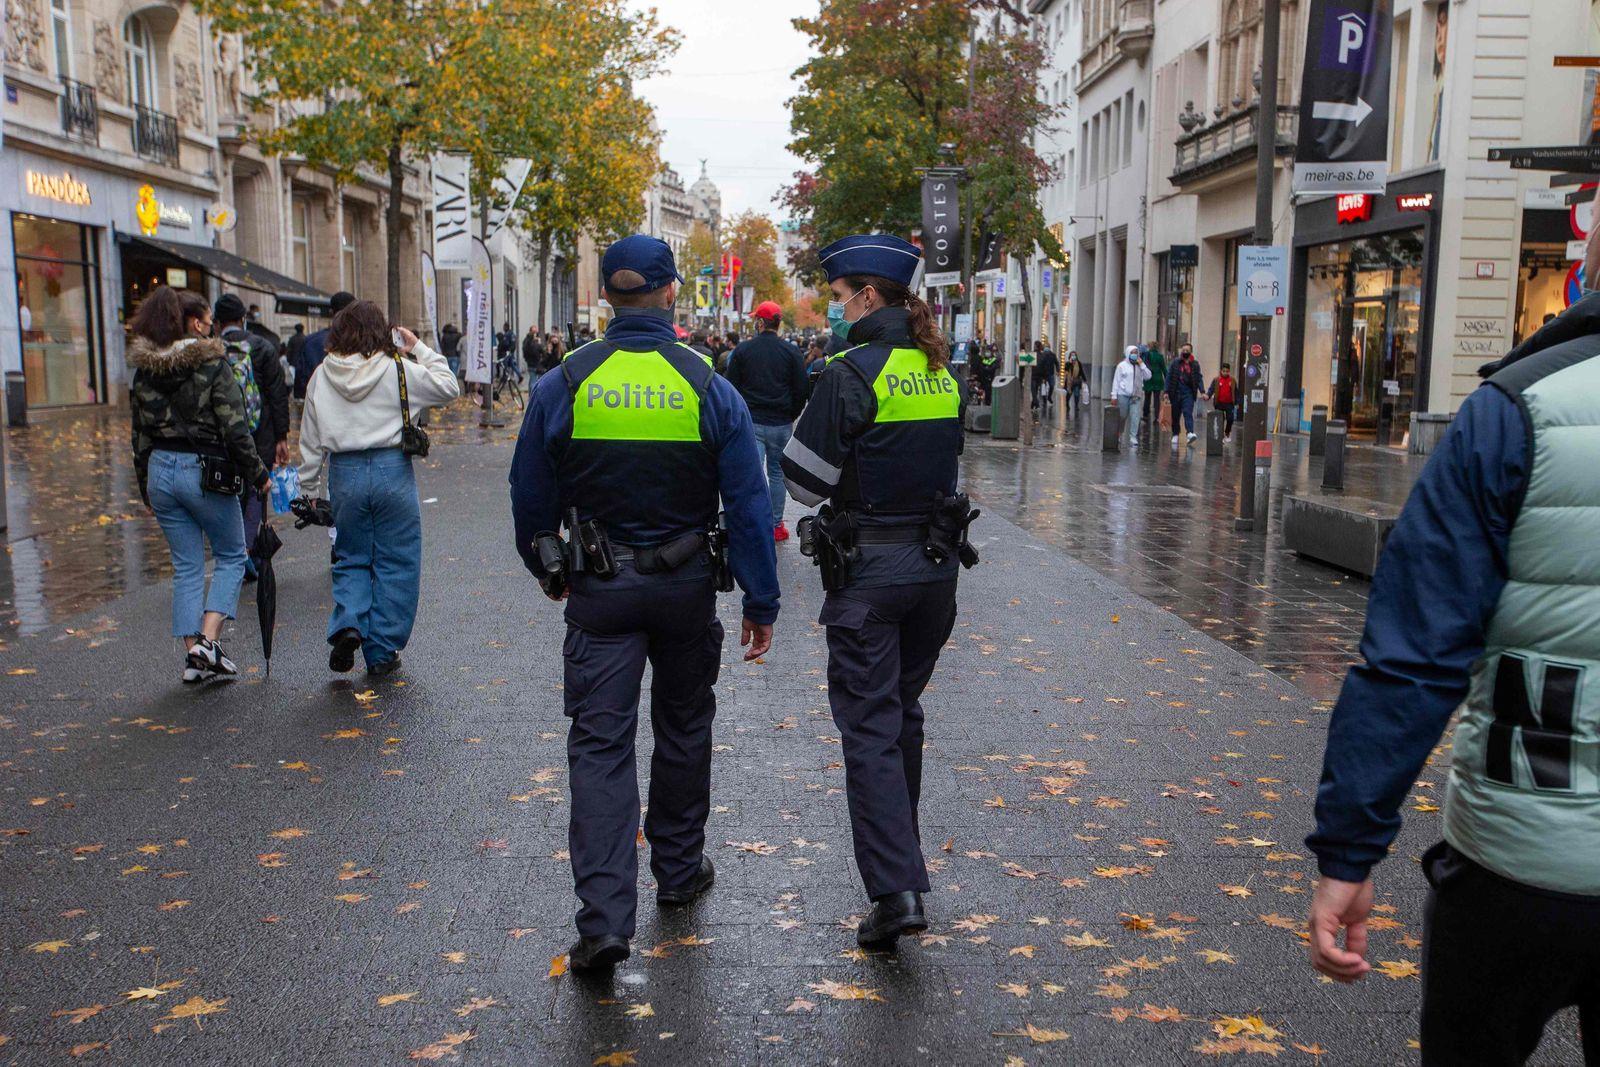 BELGIUM-HEALTH-VIRUS-POLICE